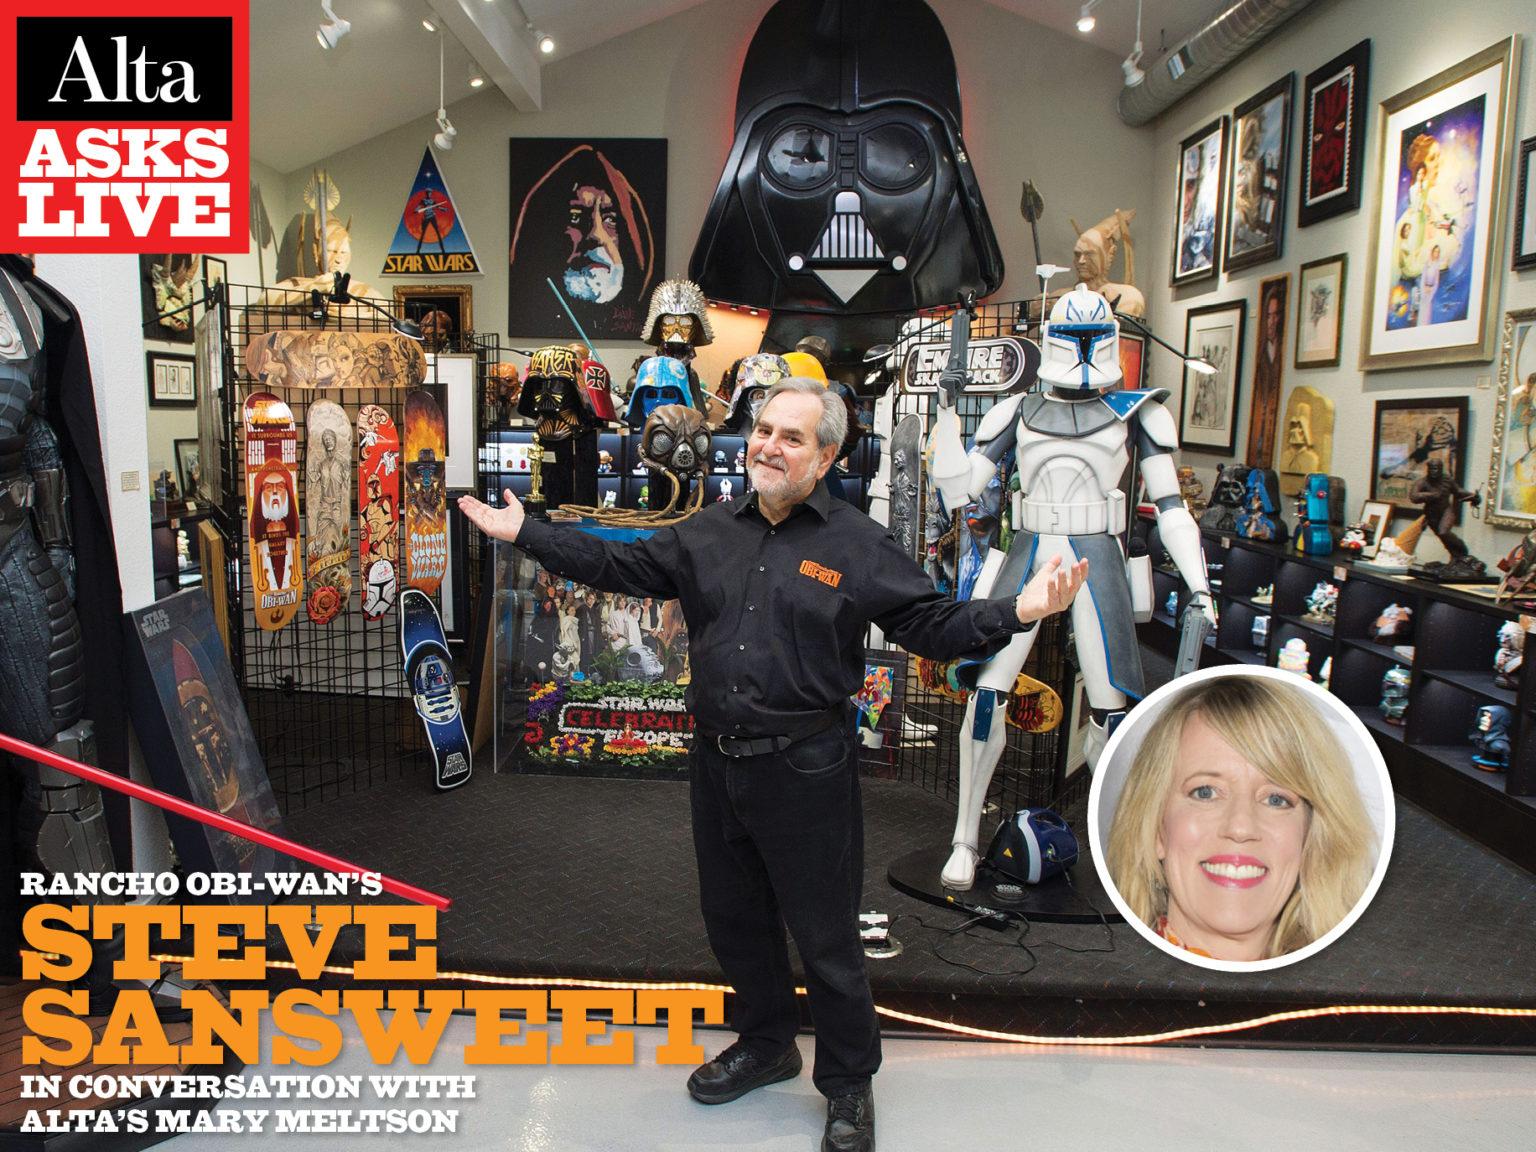 Alta Asks Live: Rancho Obi-Wan's Steve Sansweet